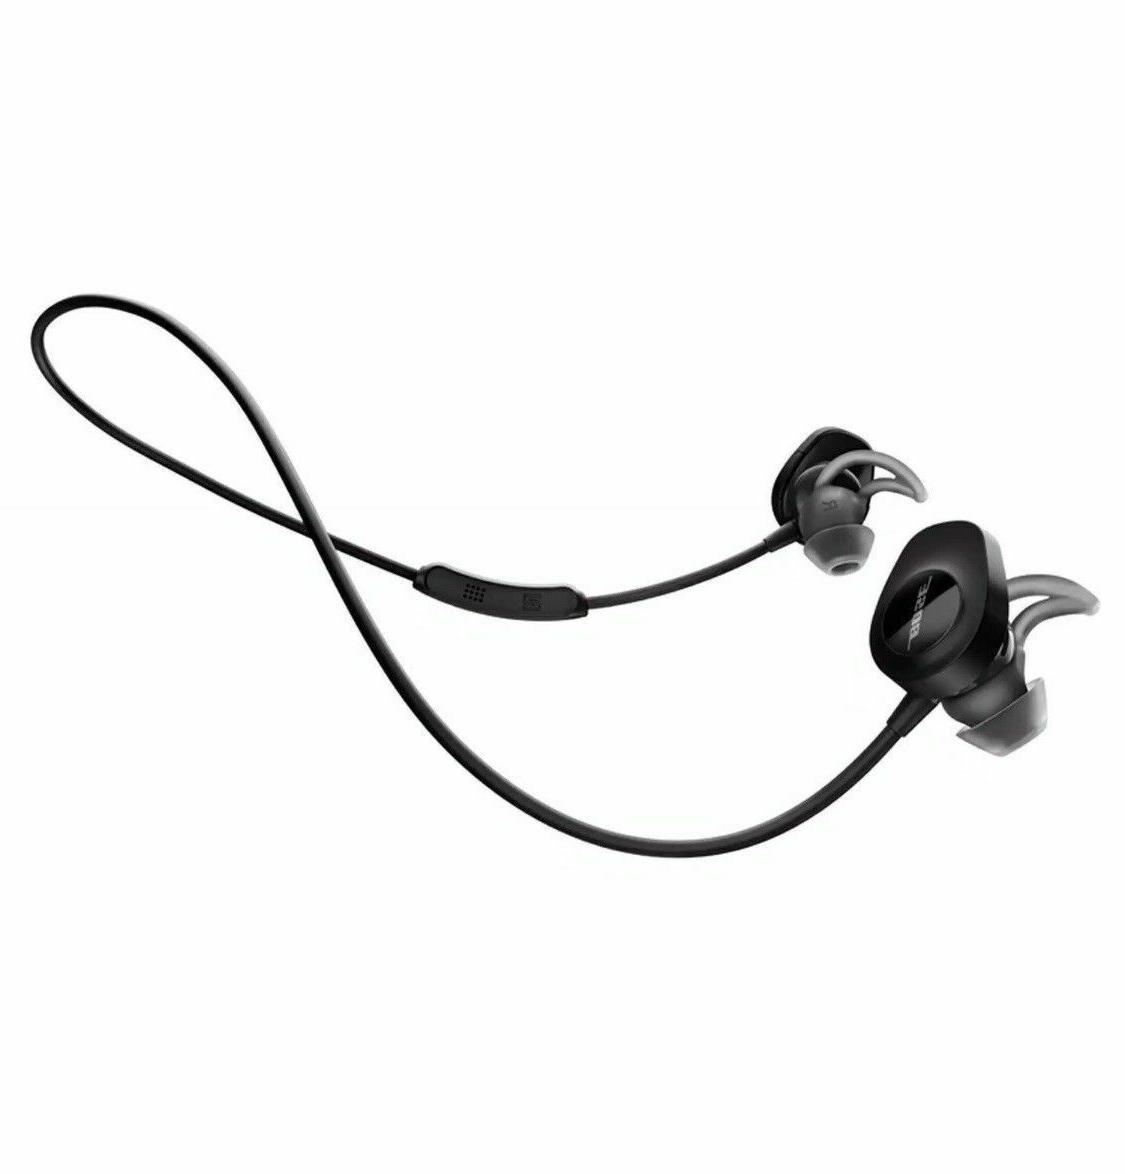 BOSE Earphones Headphones Bluetooth NEW